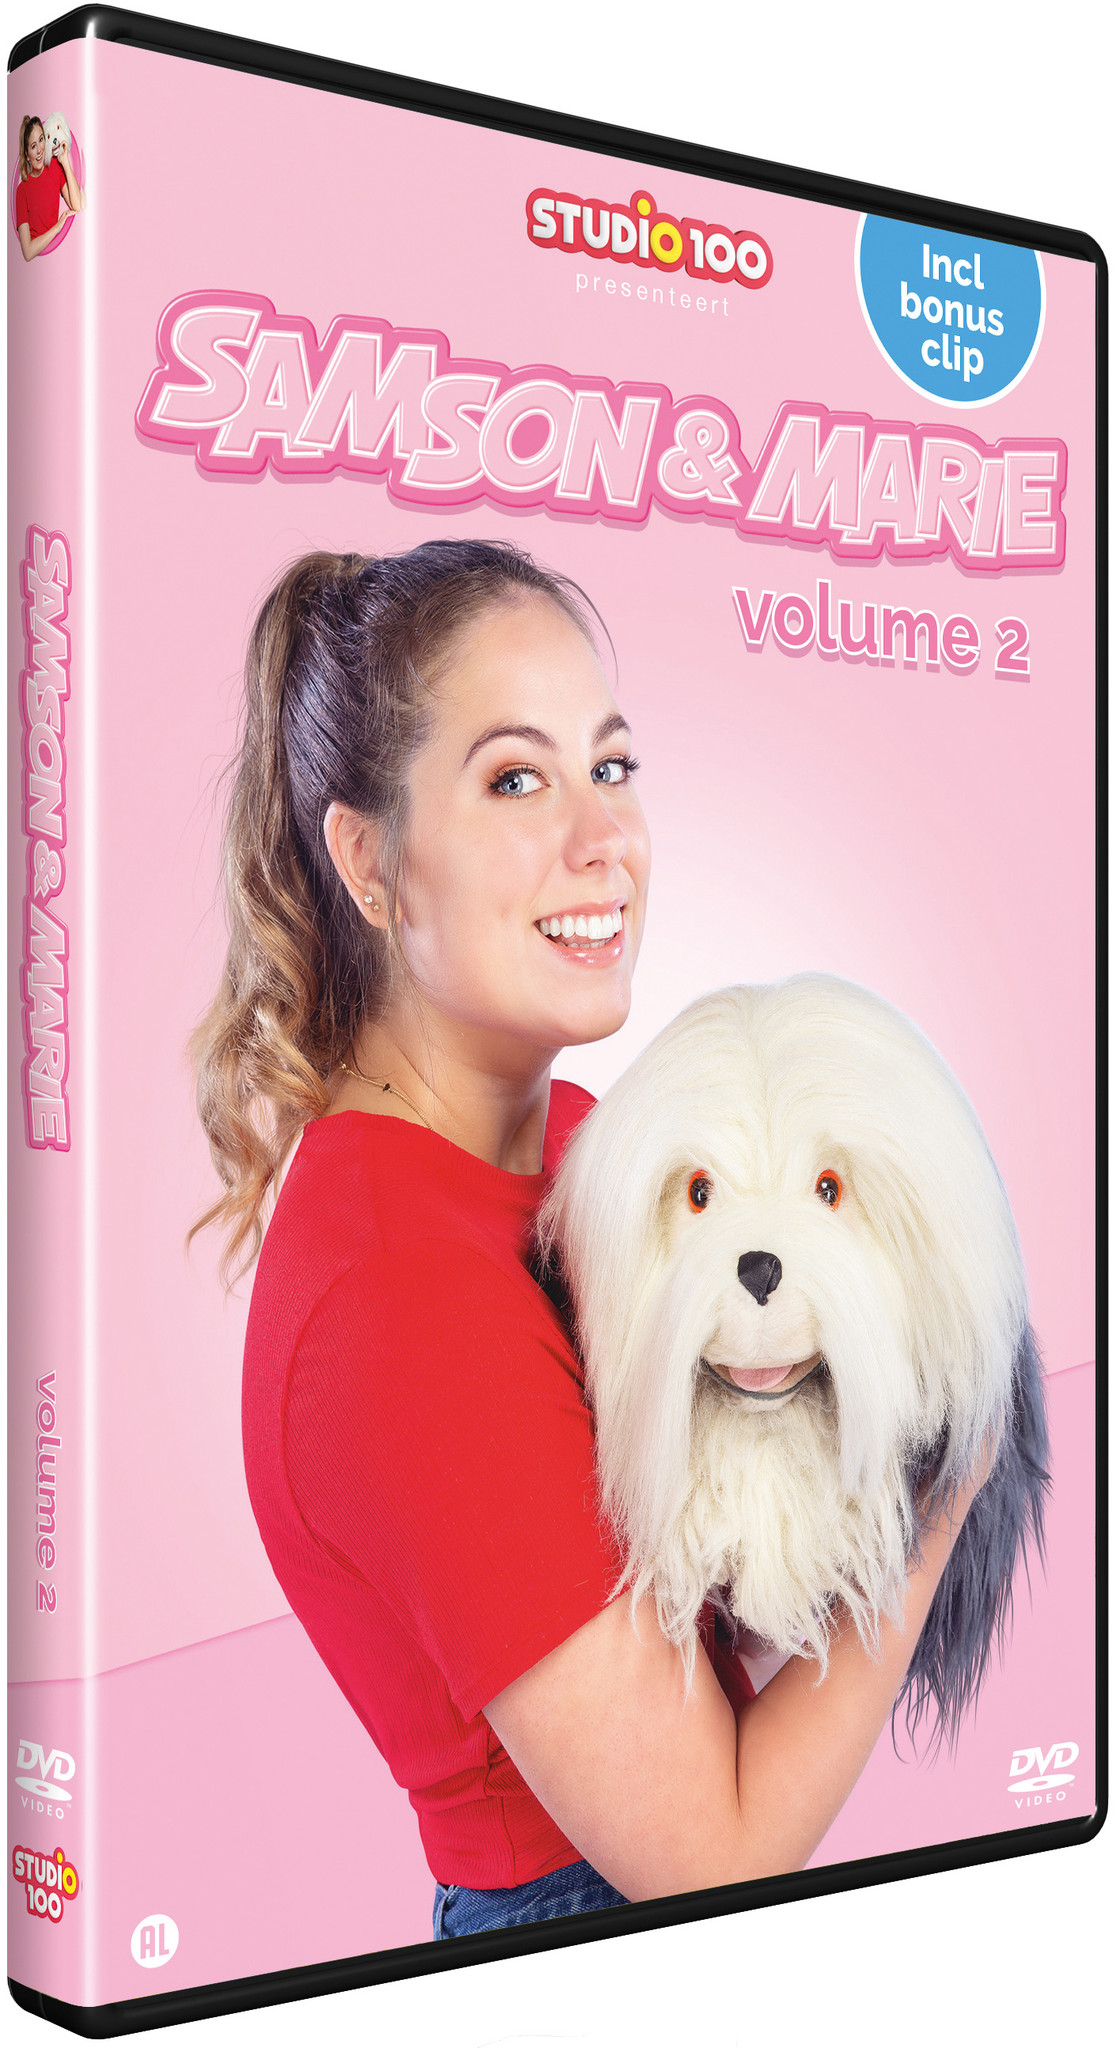 Dvd Samson en Marie: vol. 2